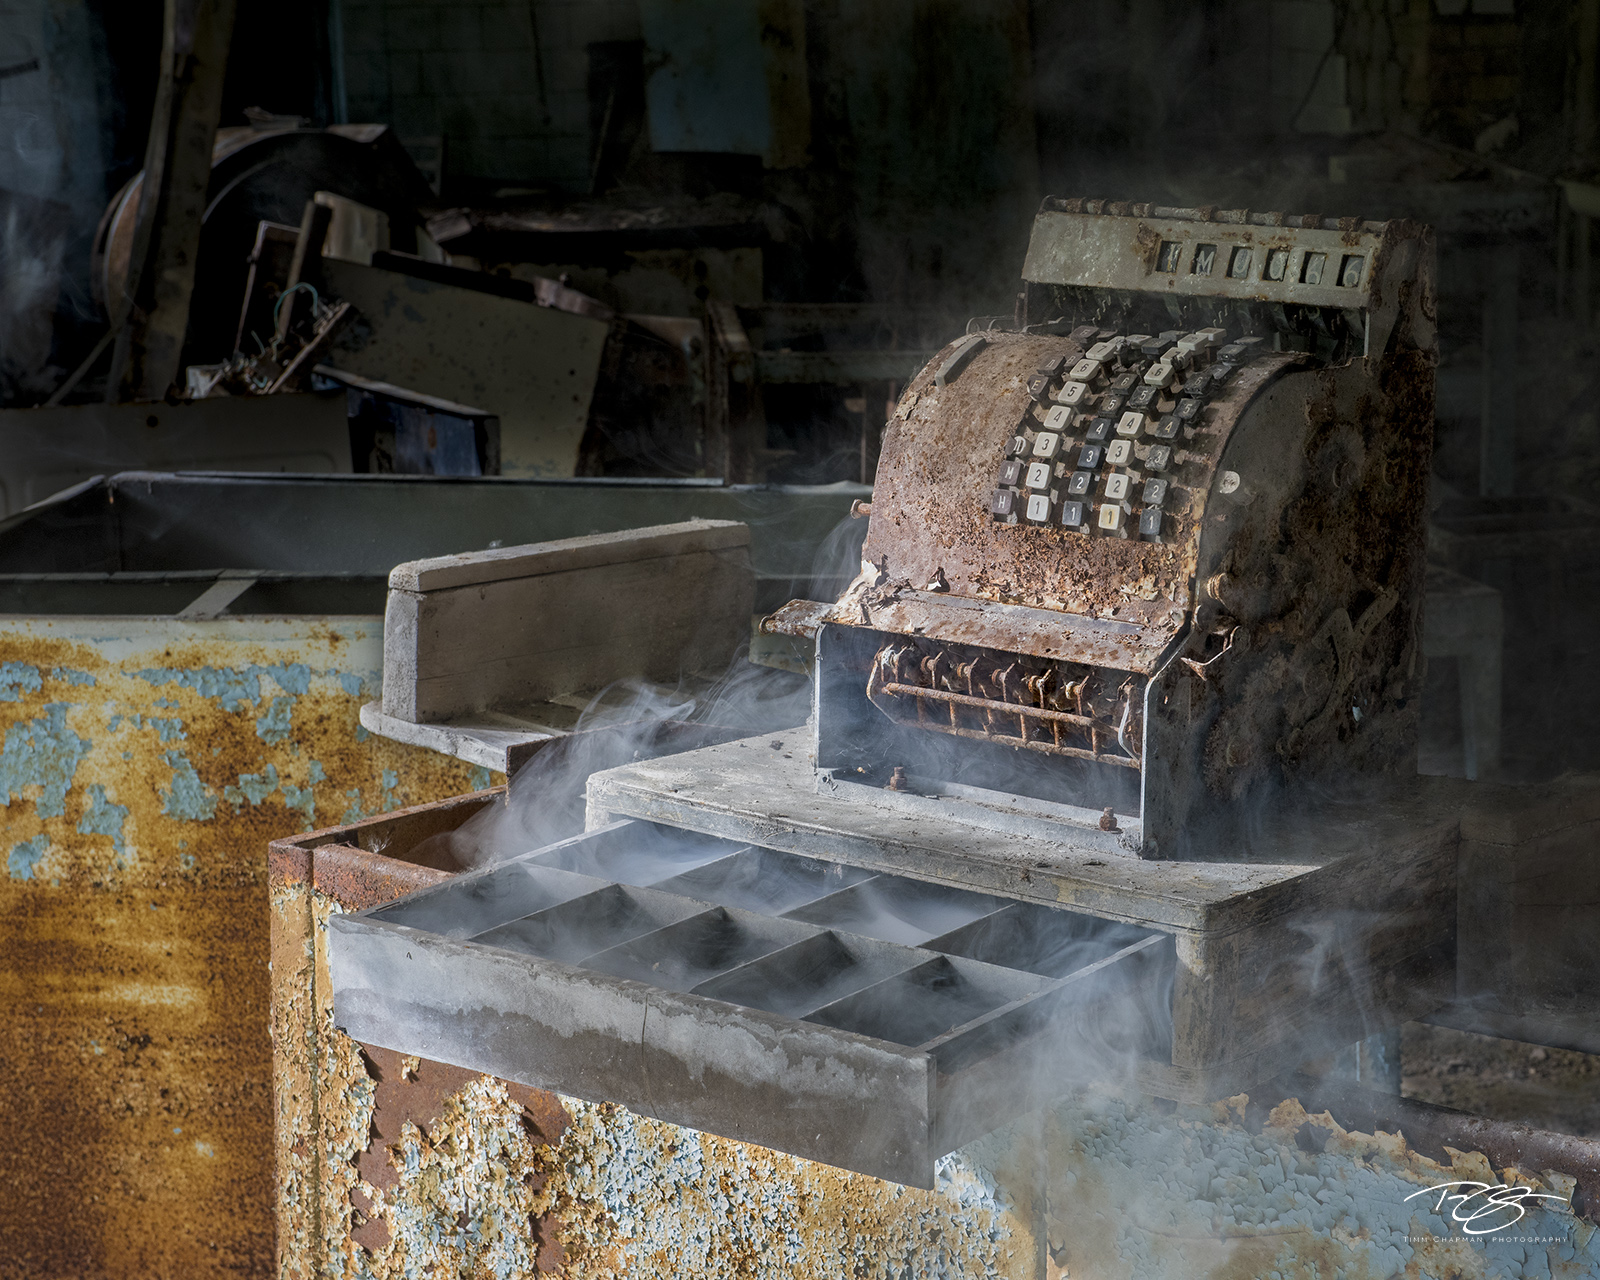 chernobyl, chornobyl, pripyat, exclusion zone, abandoned, forgotten, wasteland, radioactive, decay, peeling paint, office, factory, school, cash register, smoke, burning, cash, smolder, rust, money, c, photo